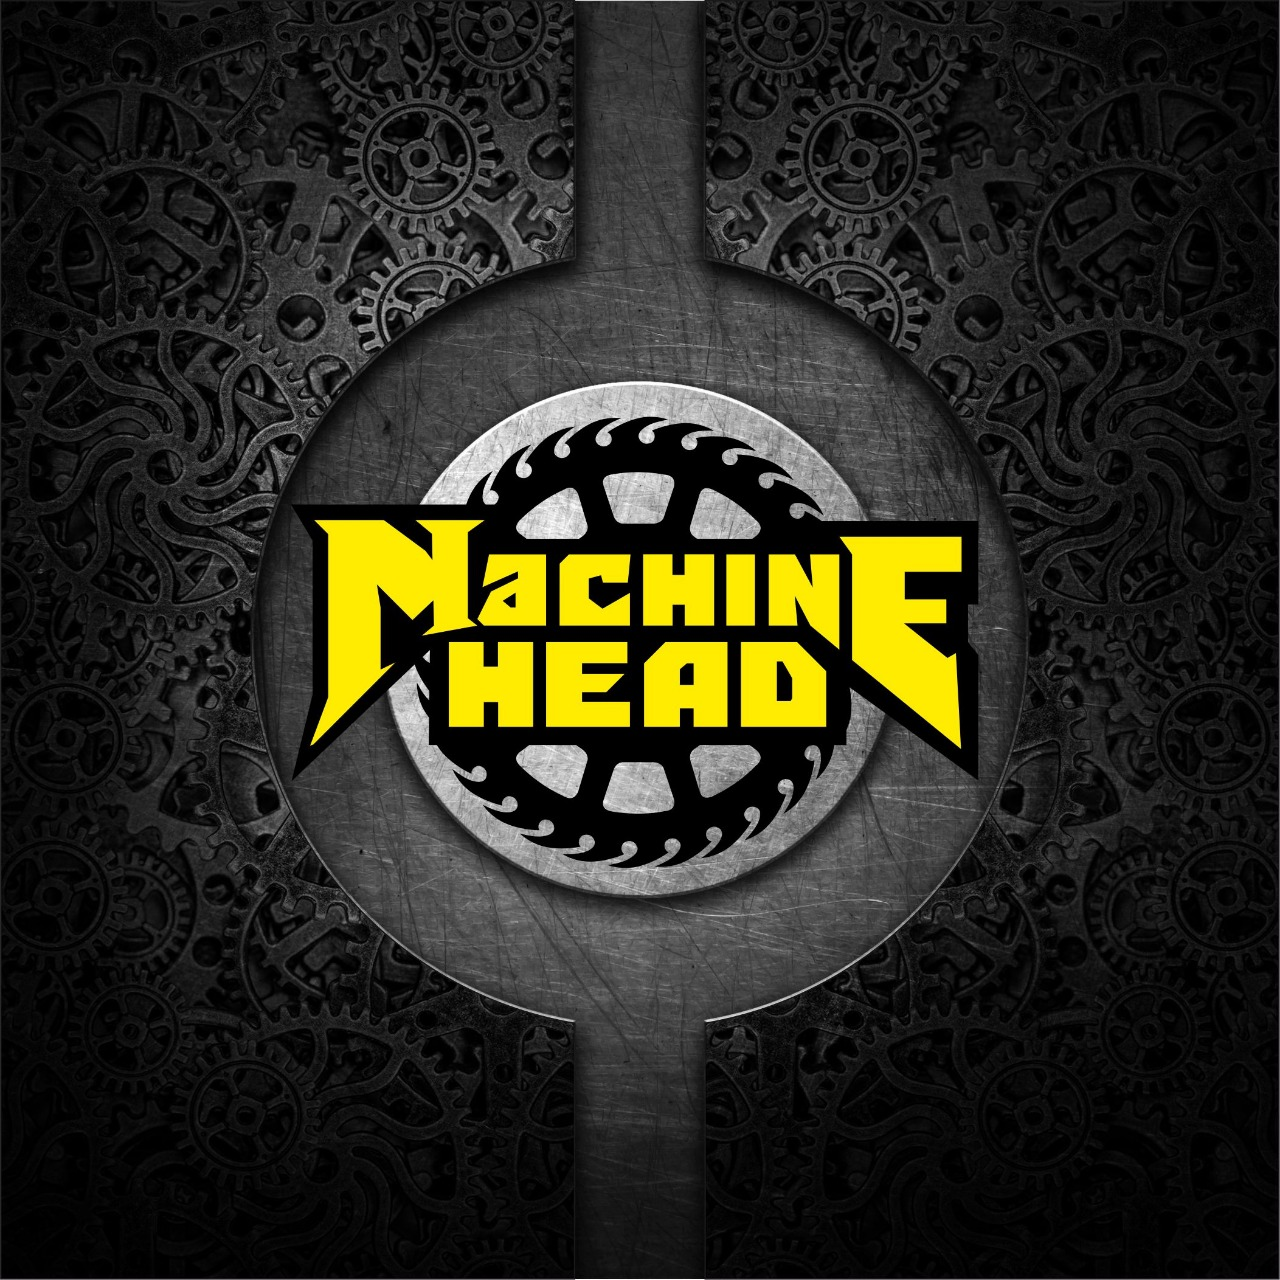 MACHINE HEAD CLUB